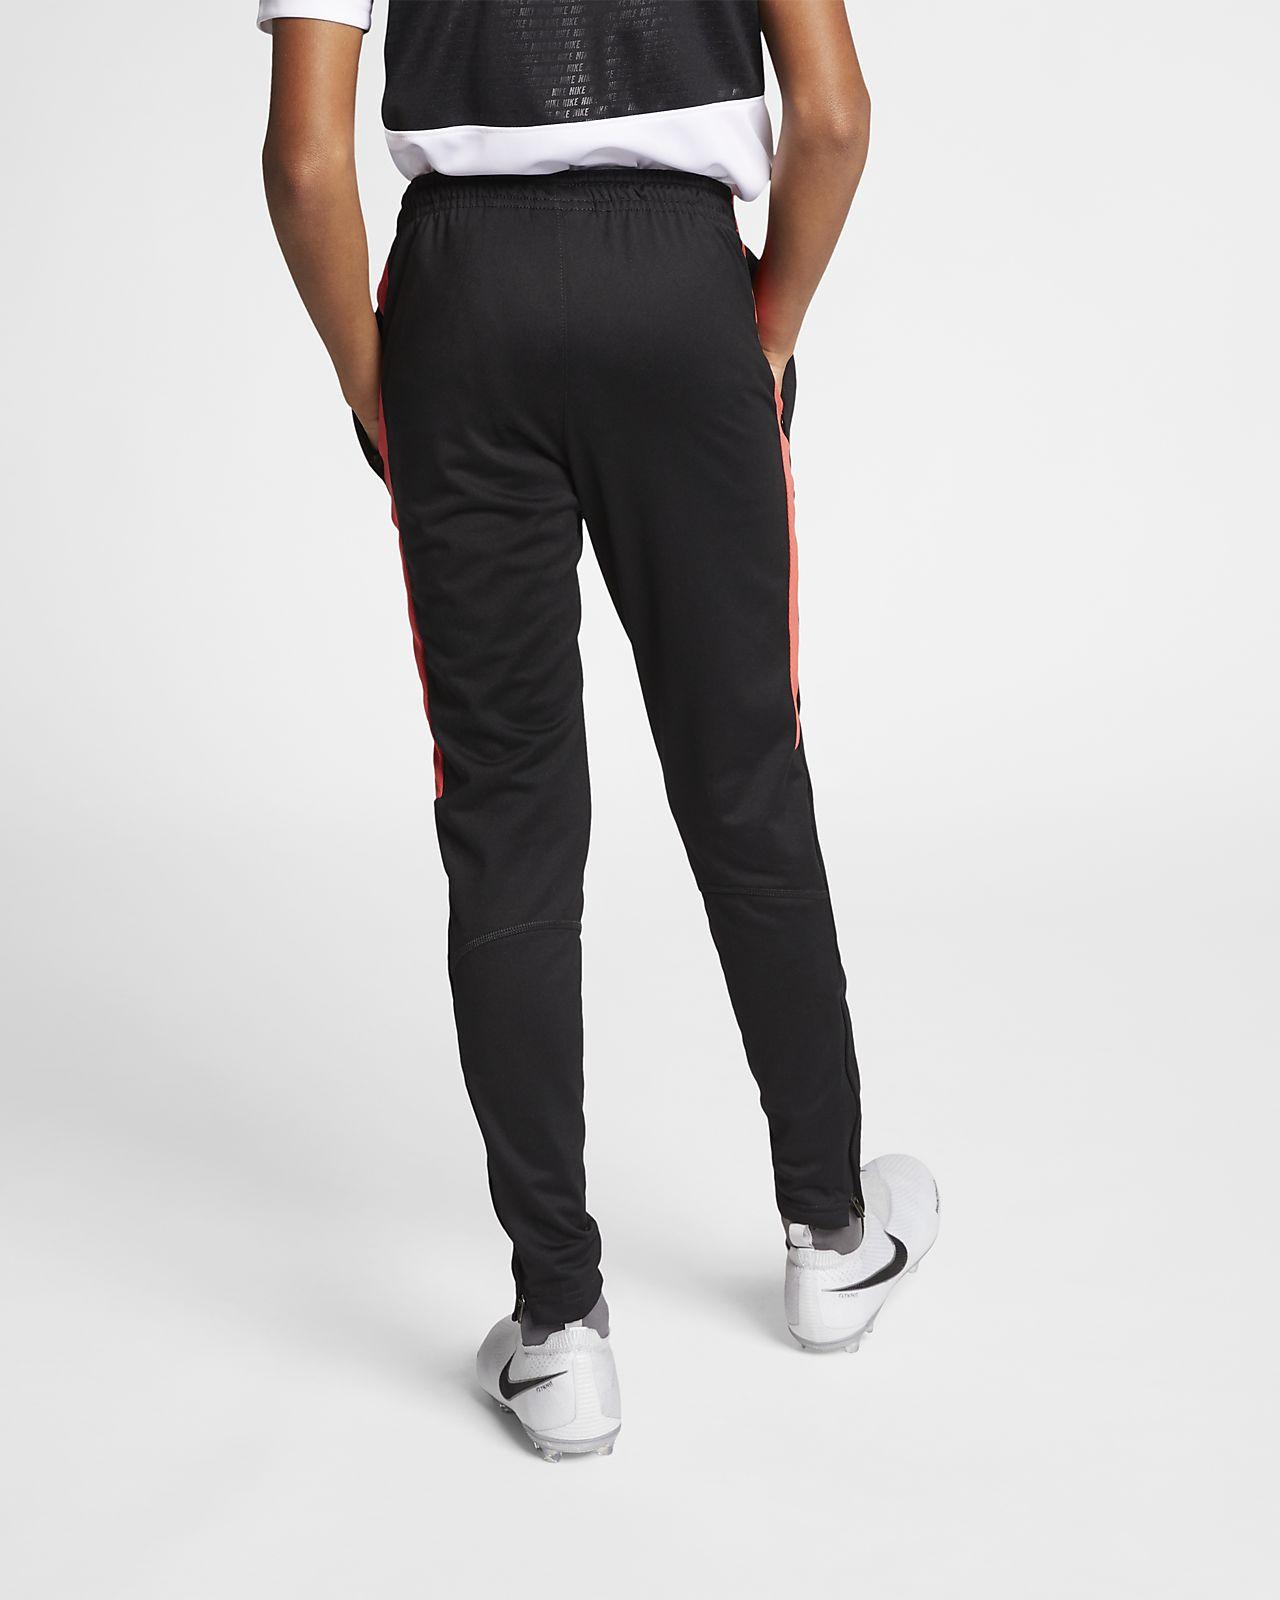 c0a64f8ca9b7c Nike Dri-FIT Academy Pantalón de fútbol - Niño a. Nike.com ES